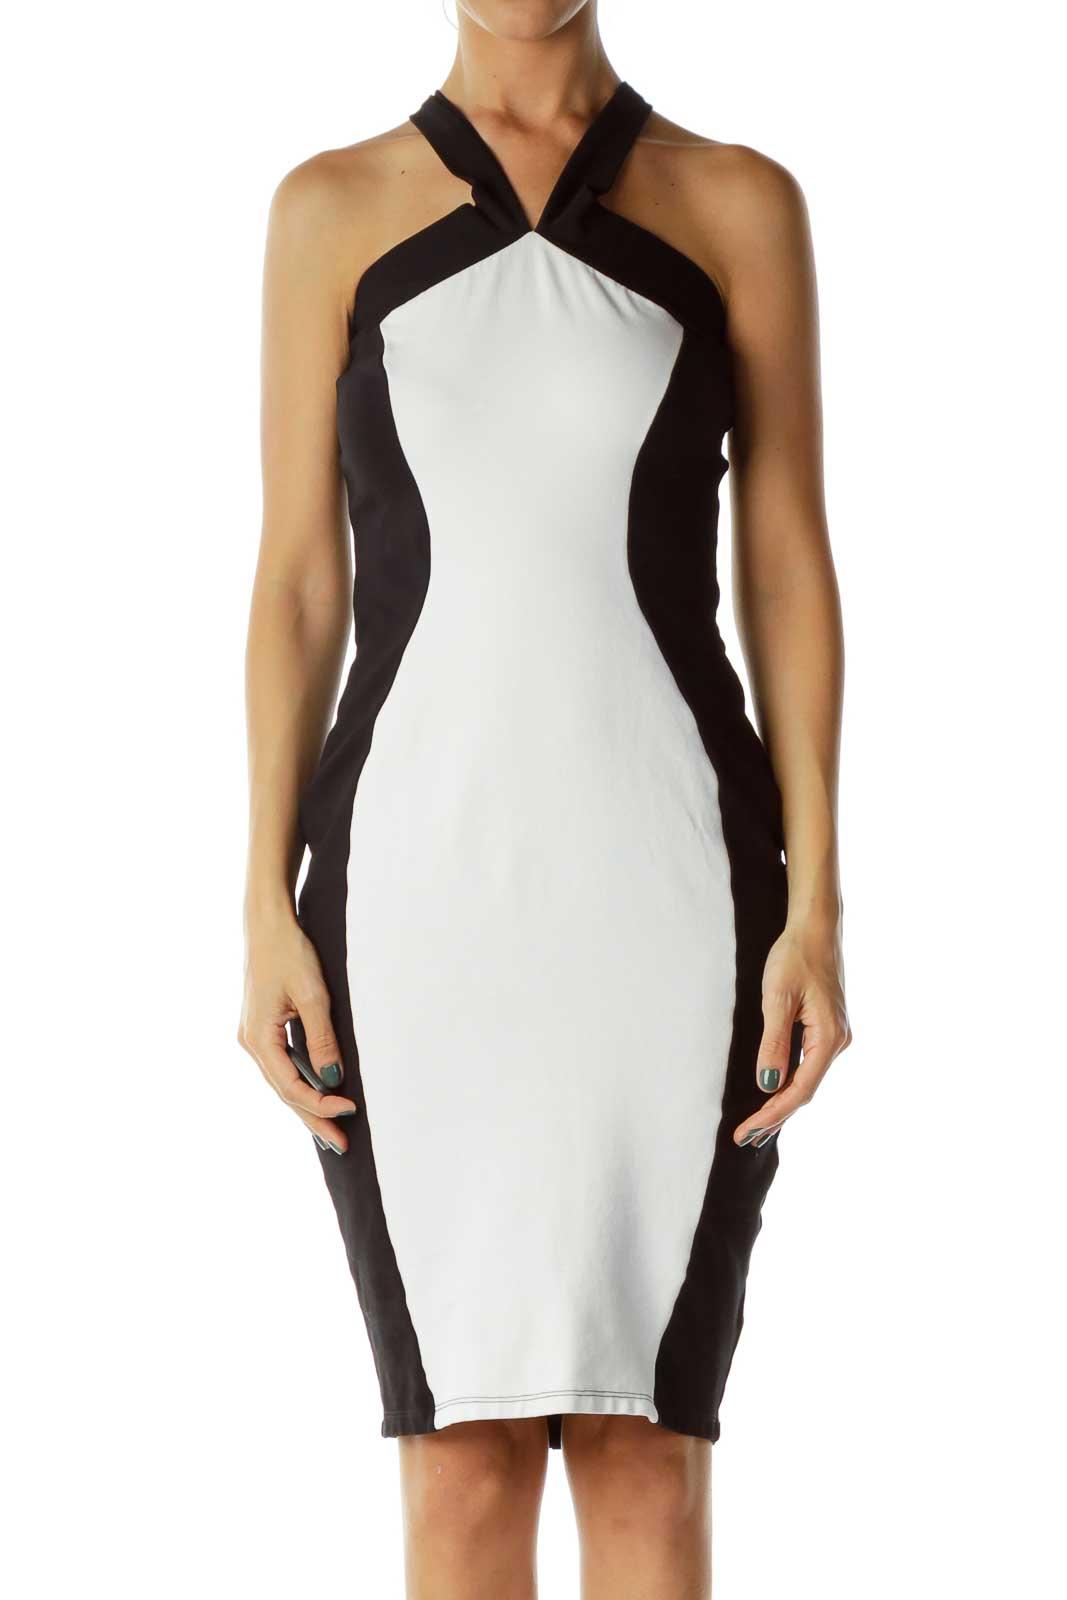 Black/White Criss-Cross Bodycon Dress Front